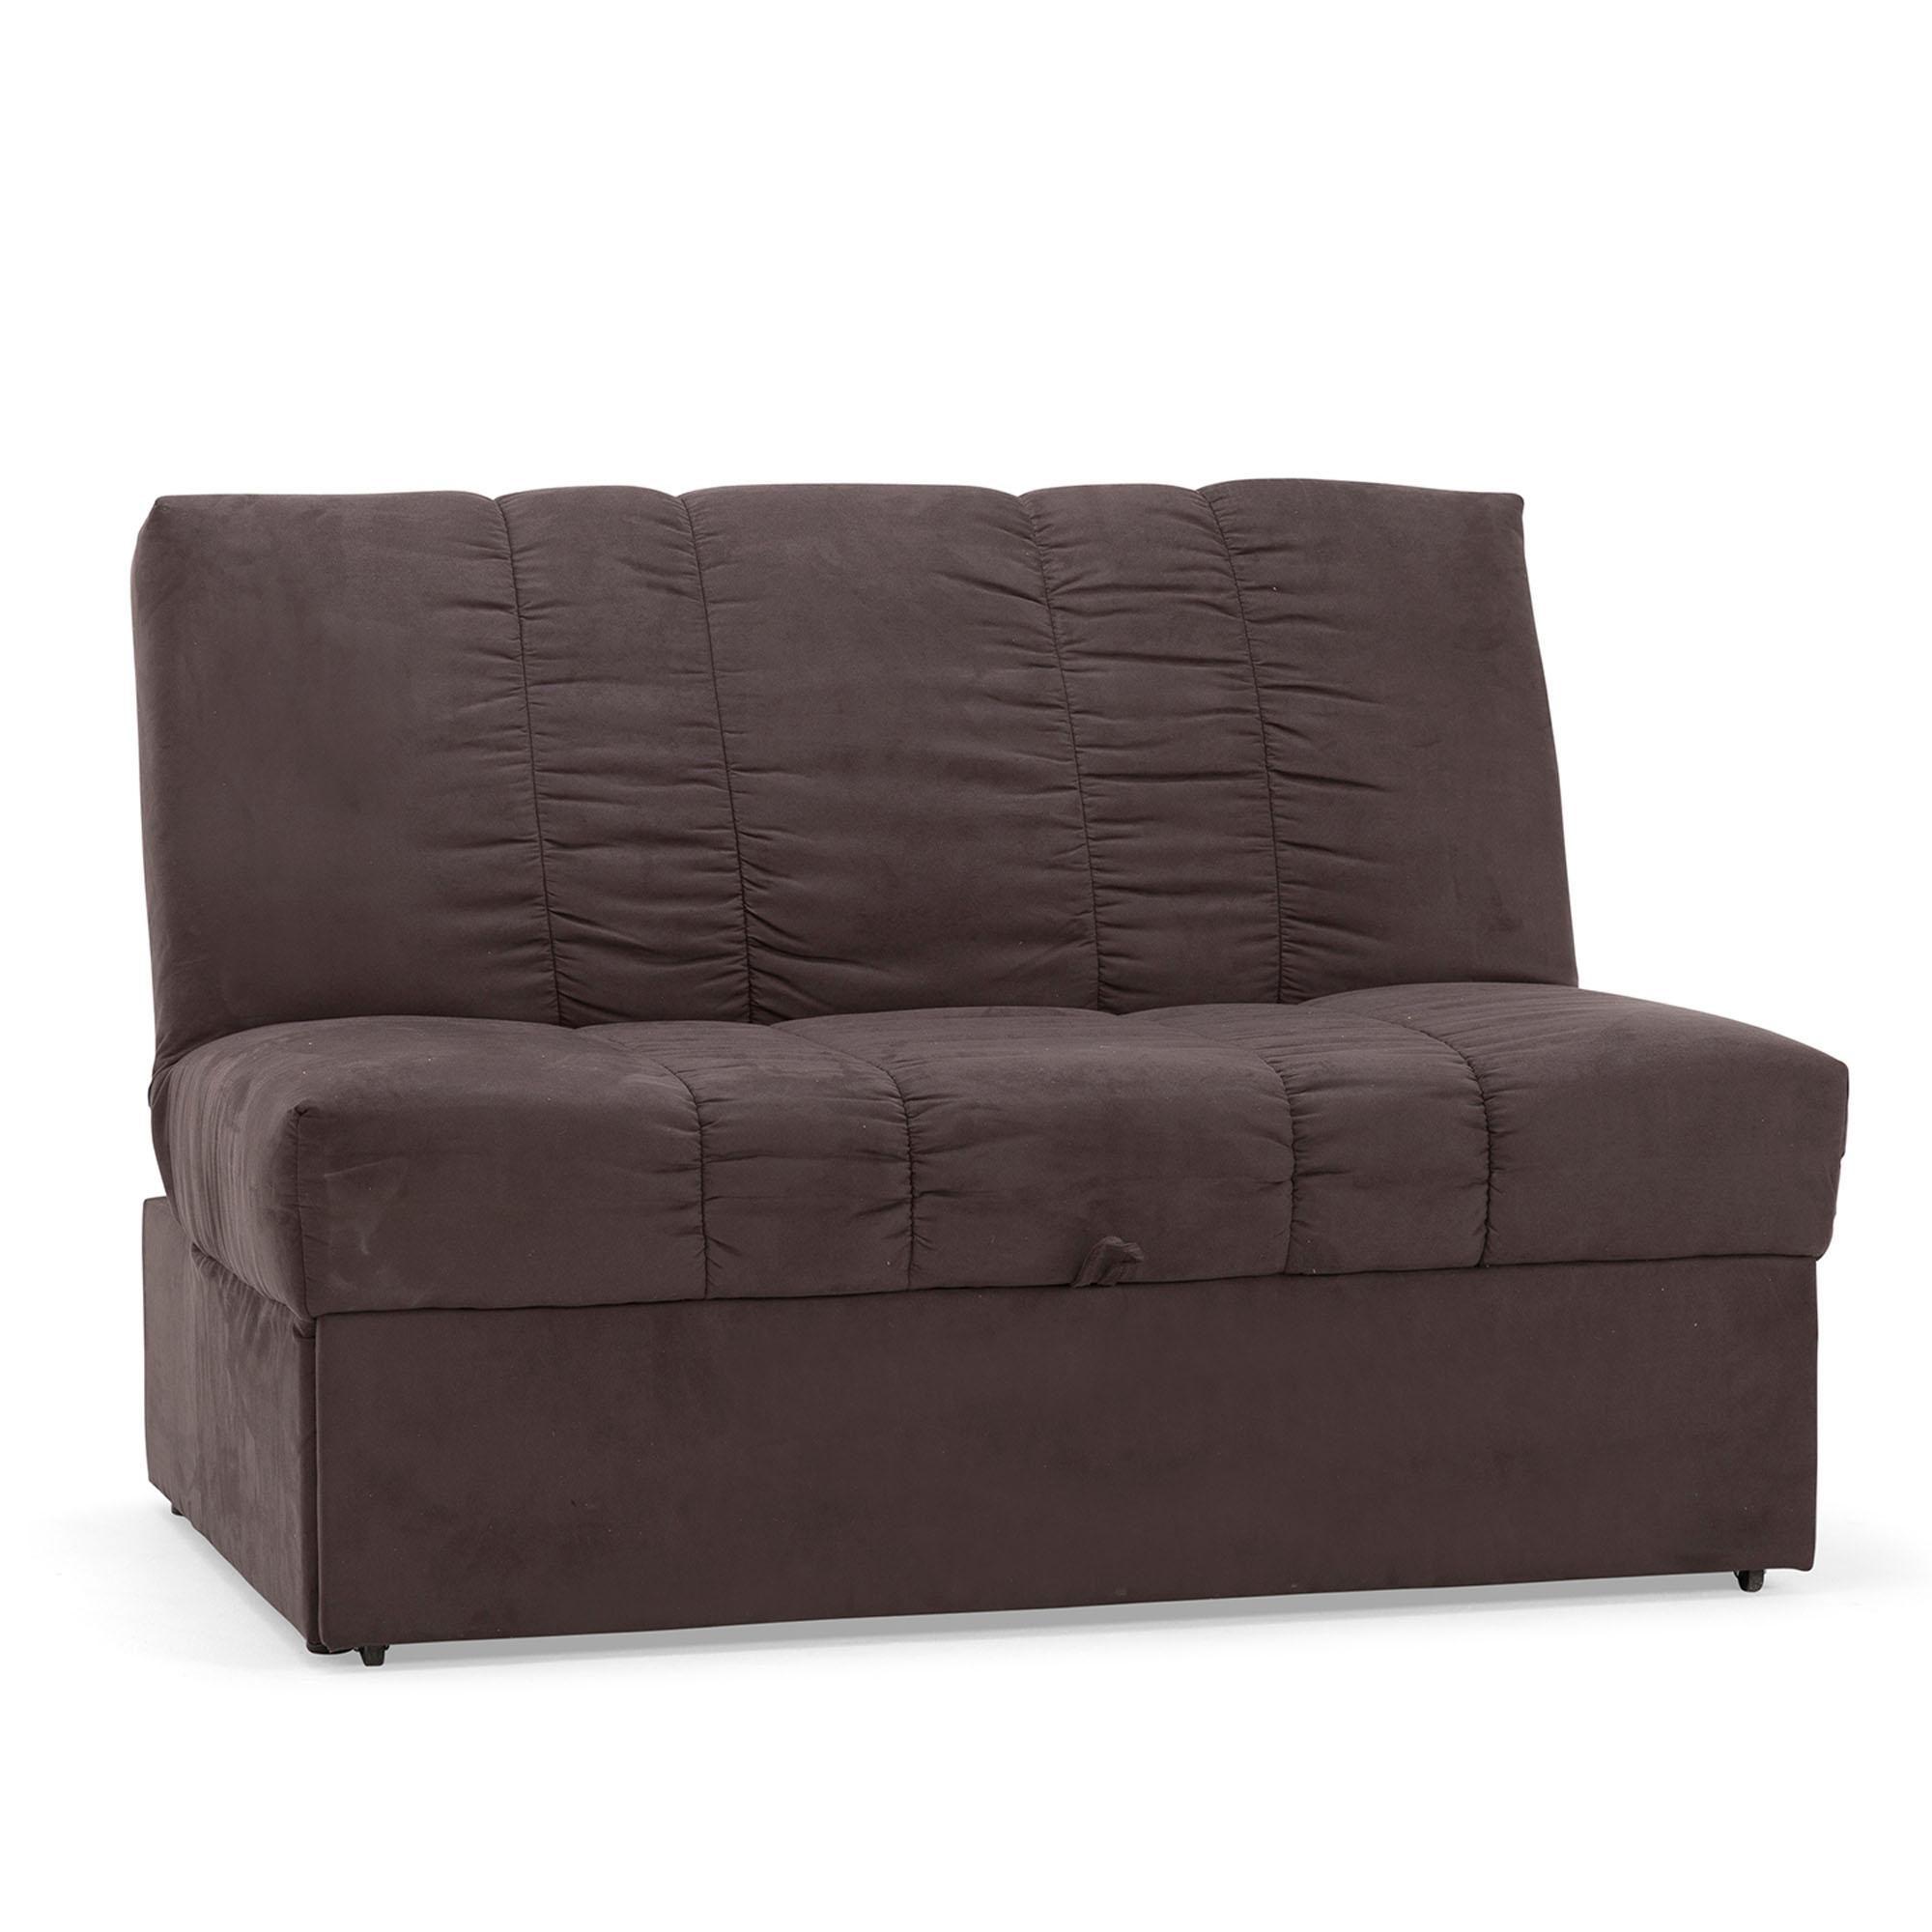 Midori Fabric Sofa Bed Cheap Sofa Beds Best Sleeper Sofa Sofa Bed